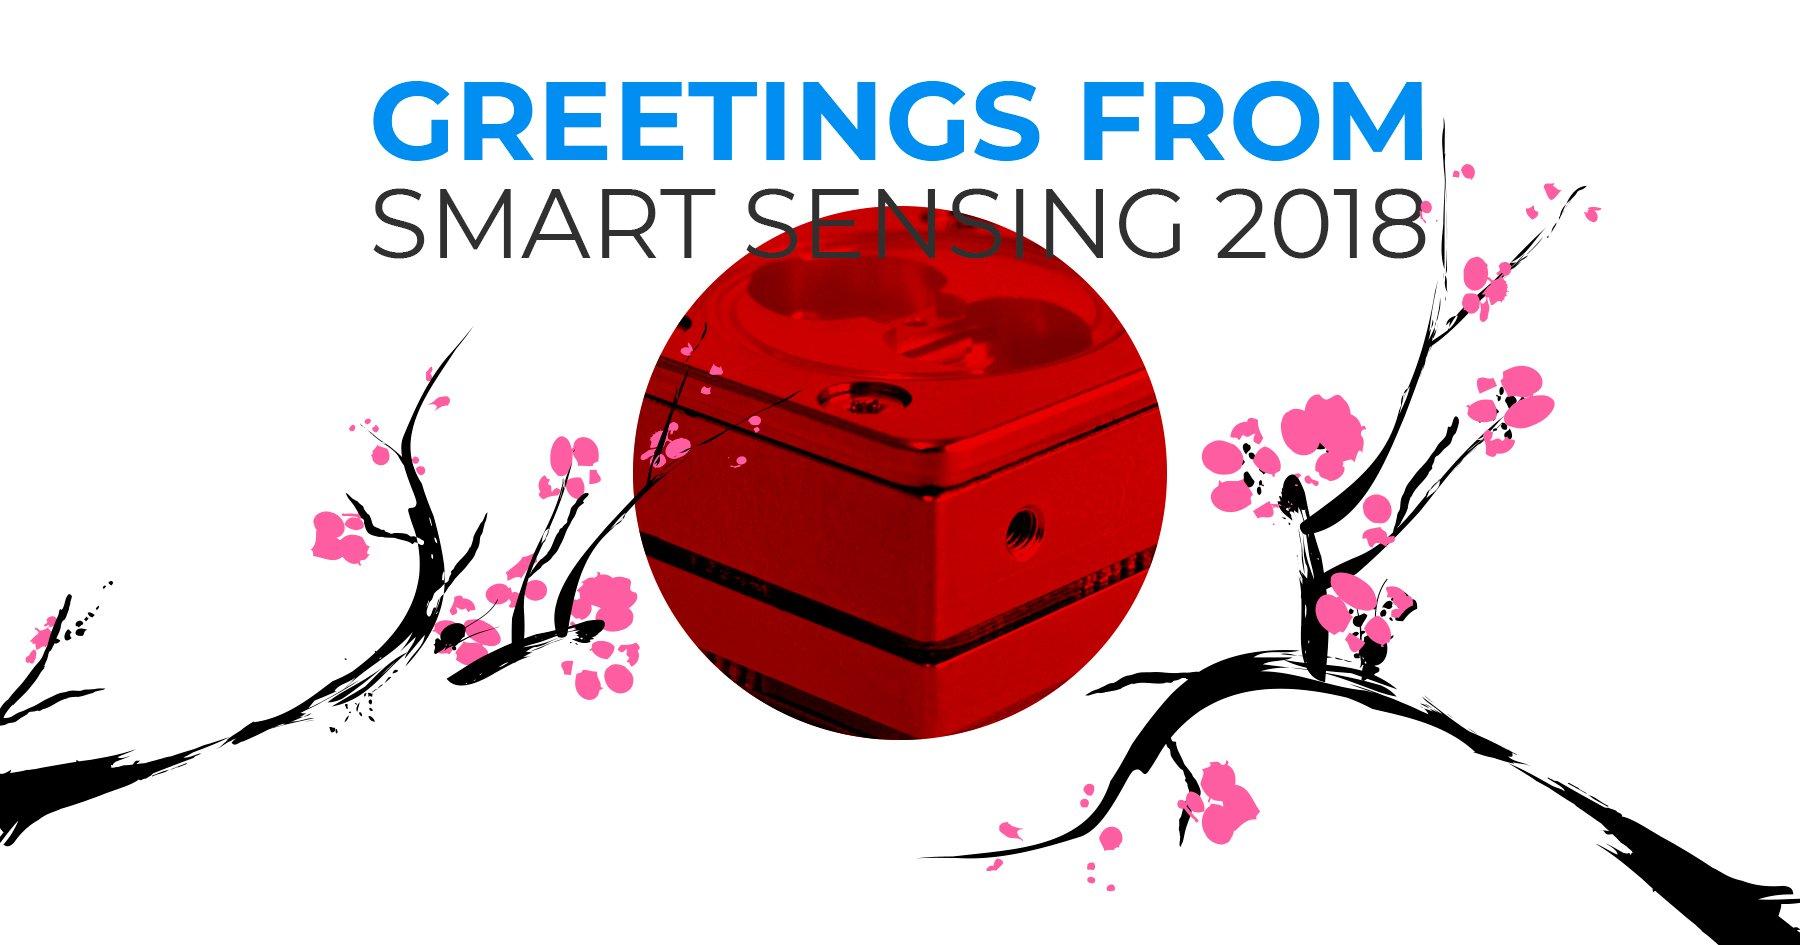 Smart Sensing conference 2018 in Tokyo